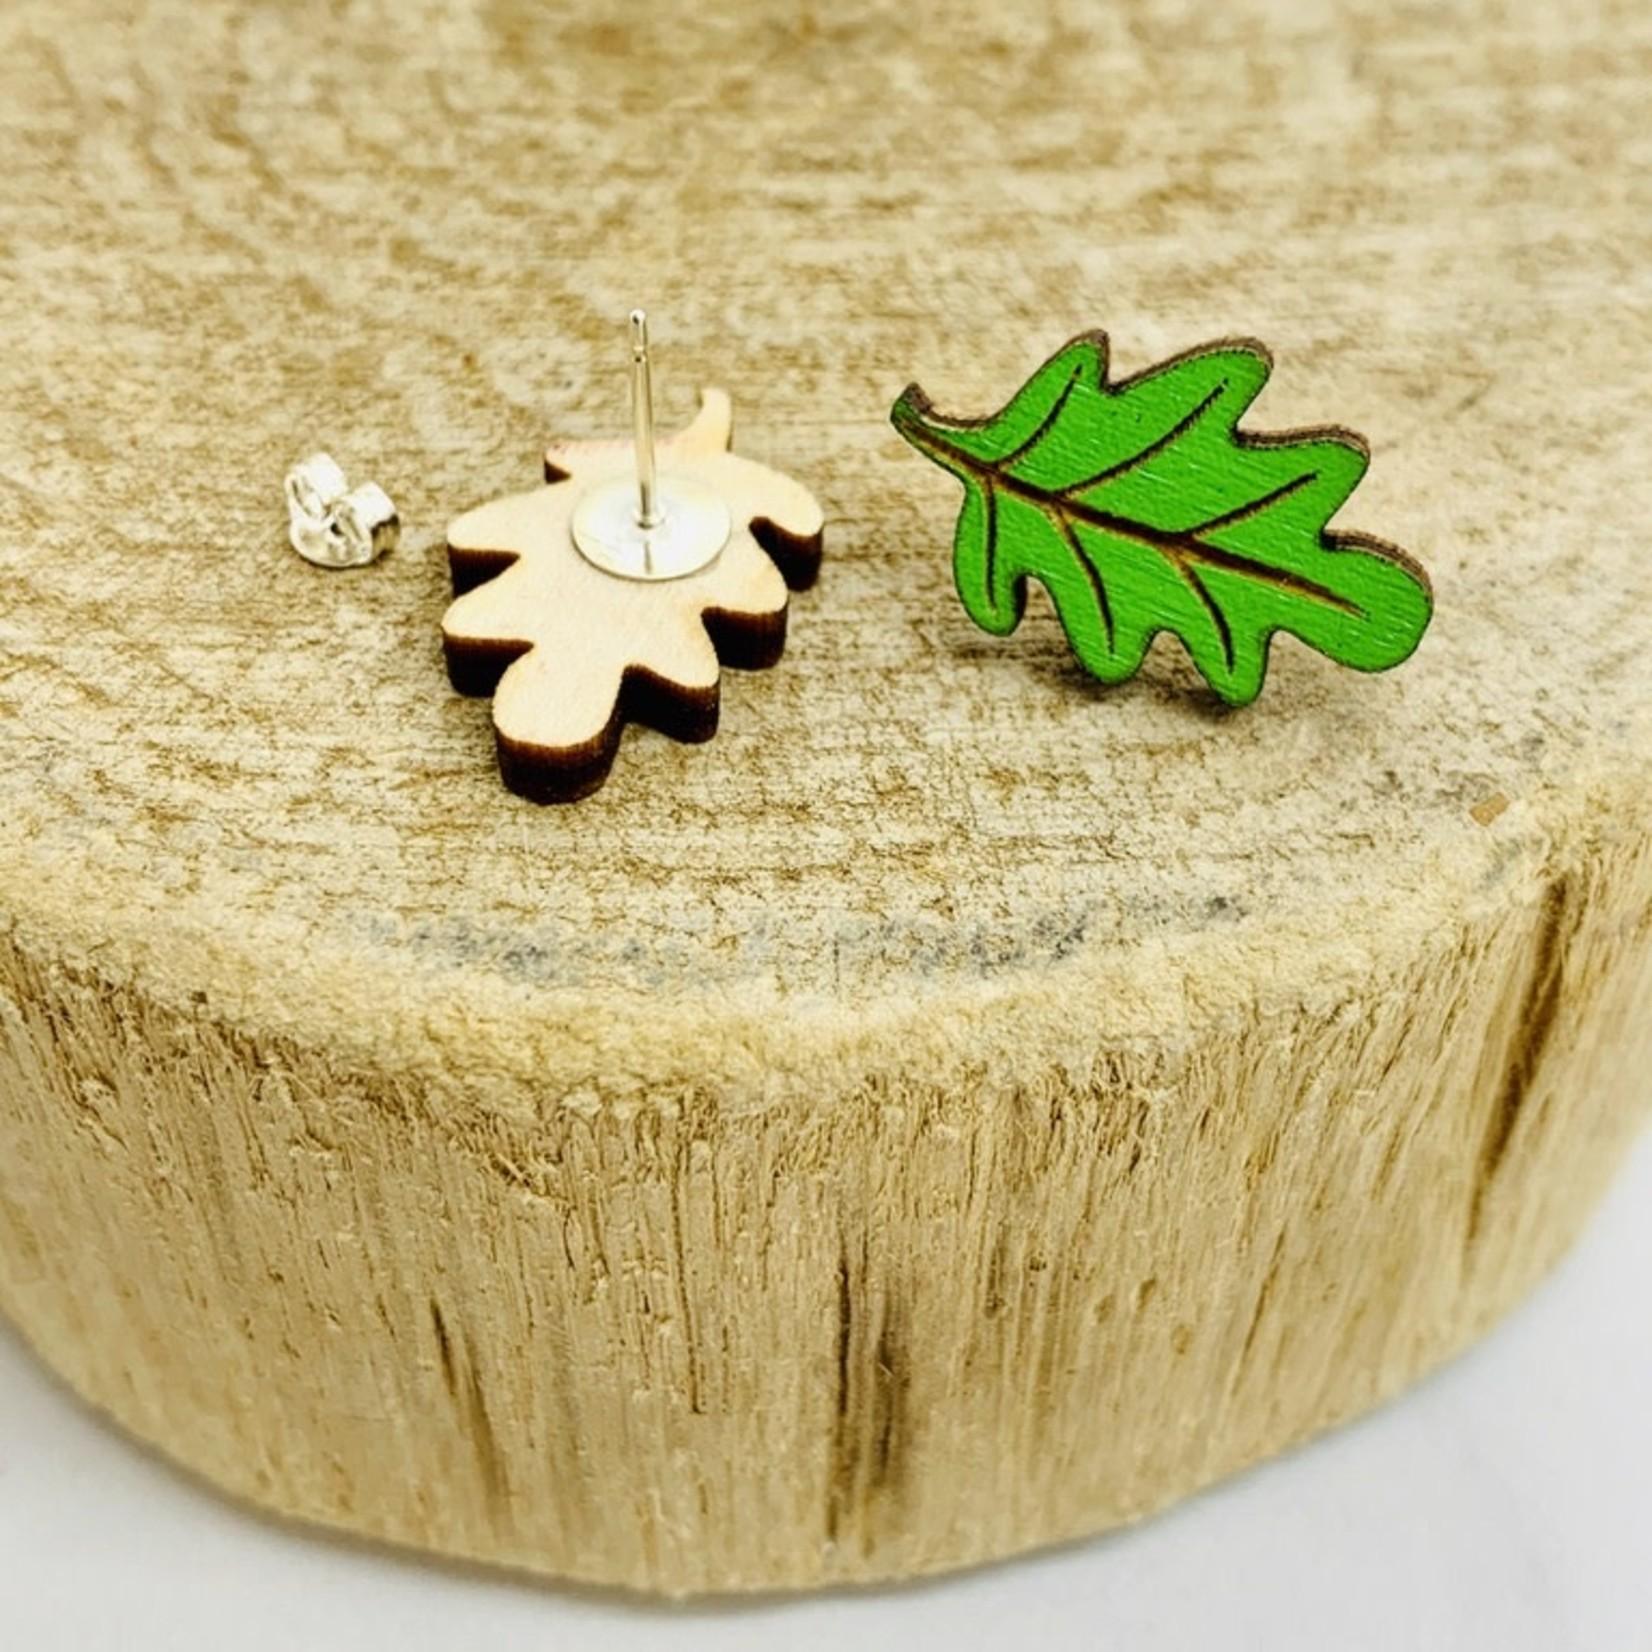 Handmade Green Leaf Lasercut Wood Earrings on Sterling Silver Posts